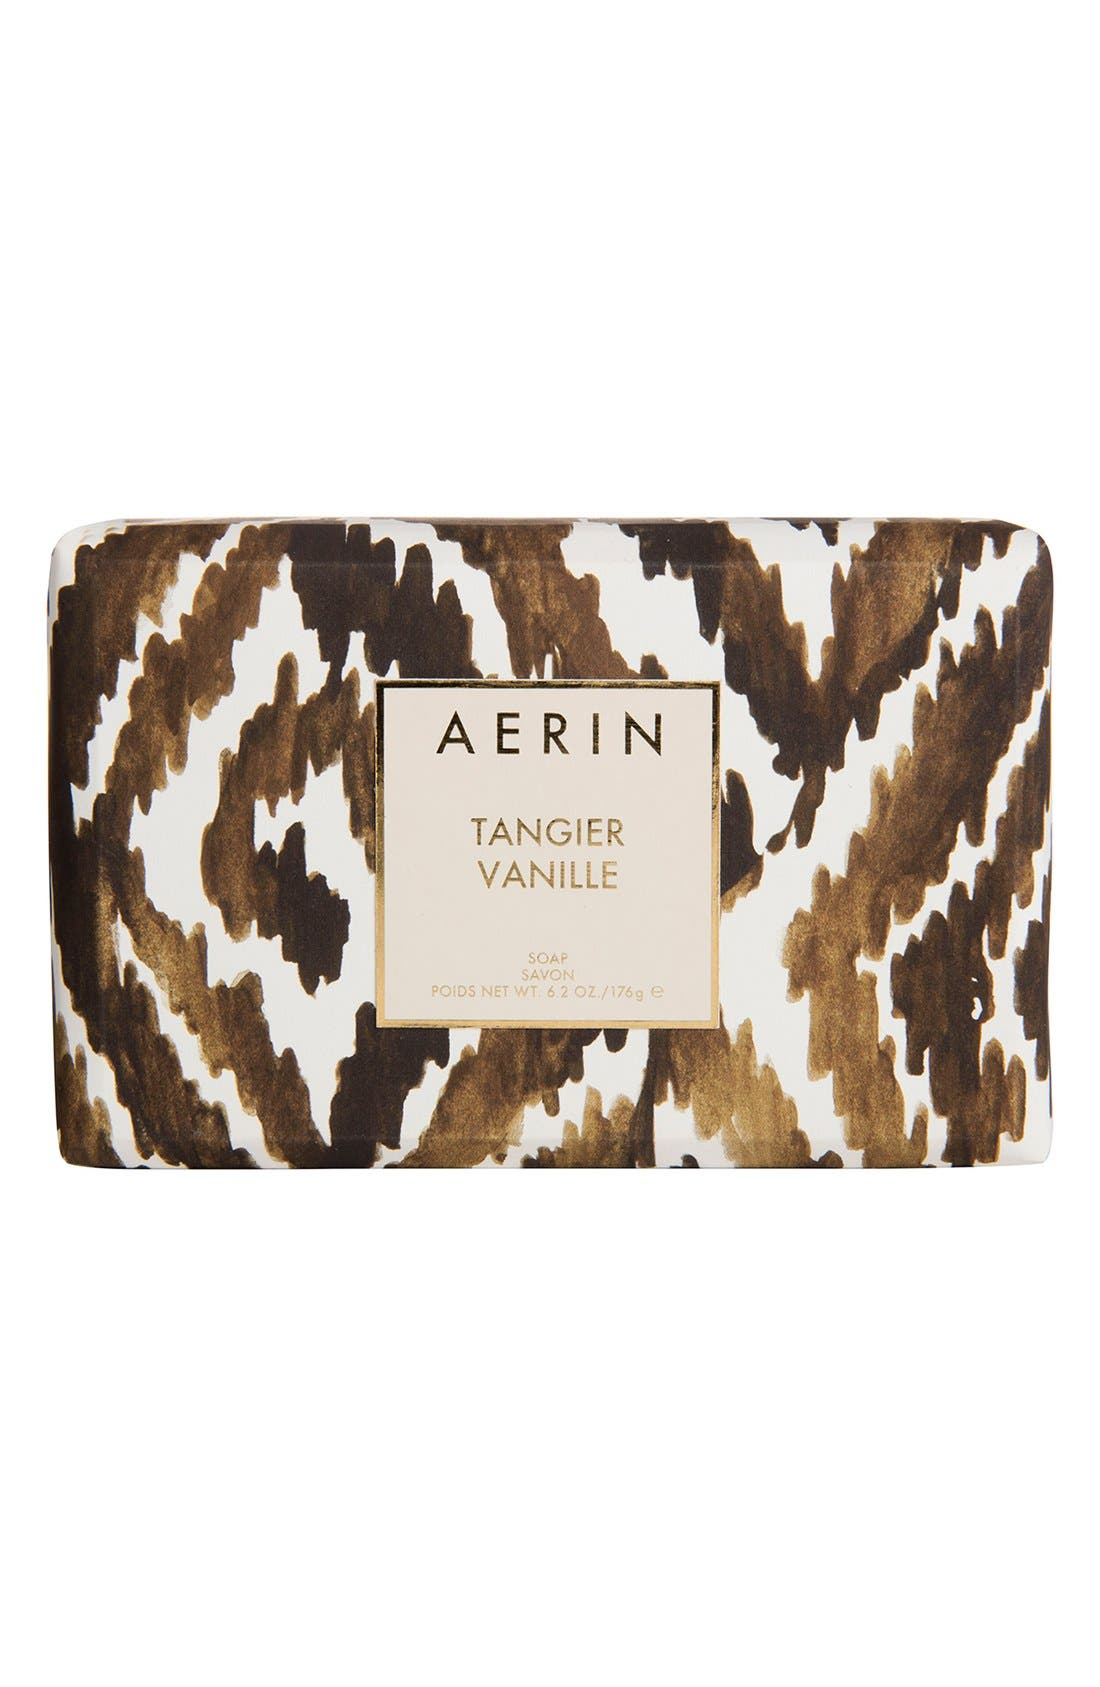 AERIN Beauty Tangier Vanille Soap